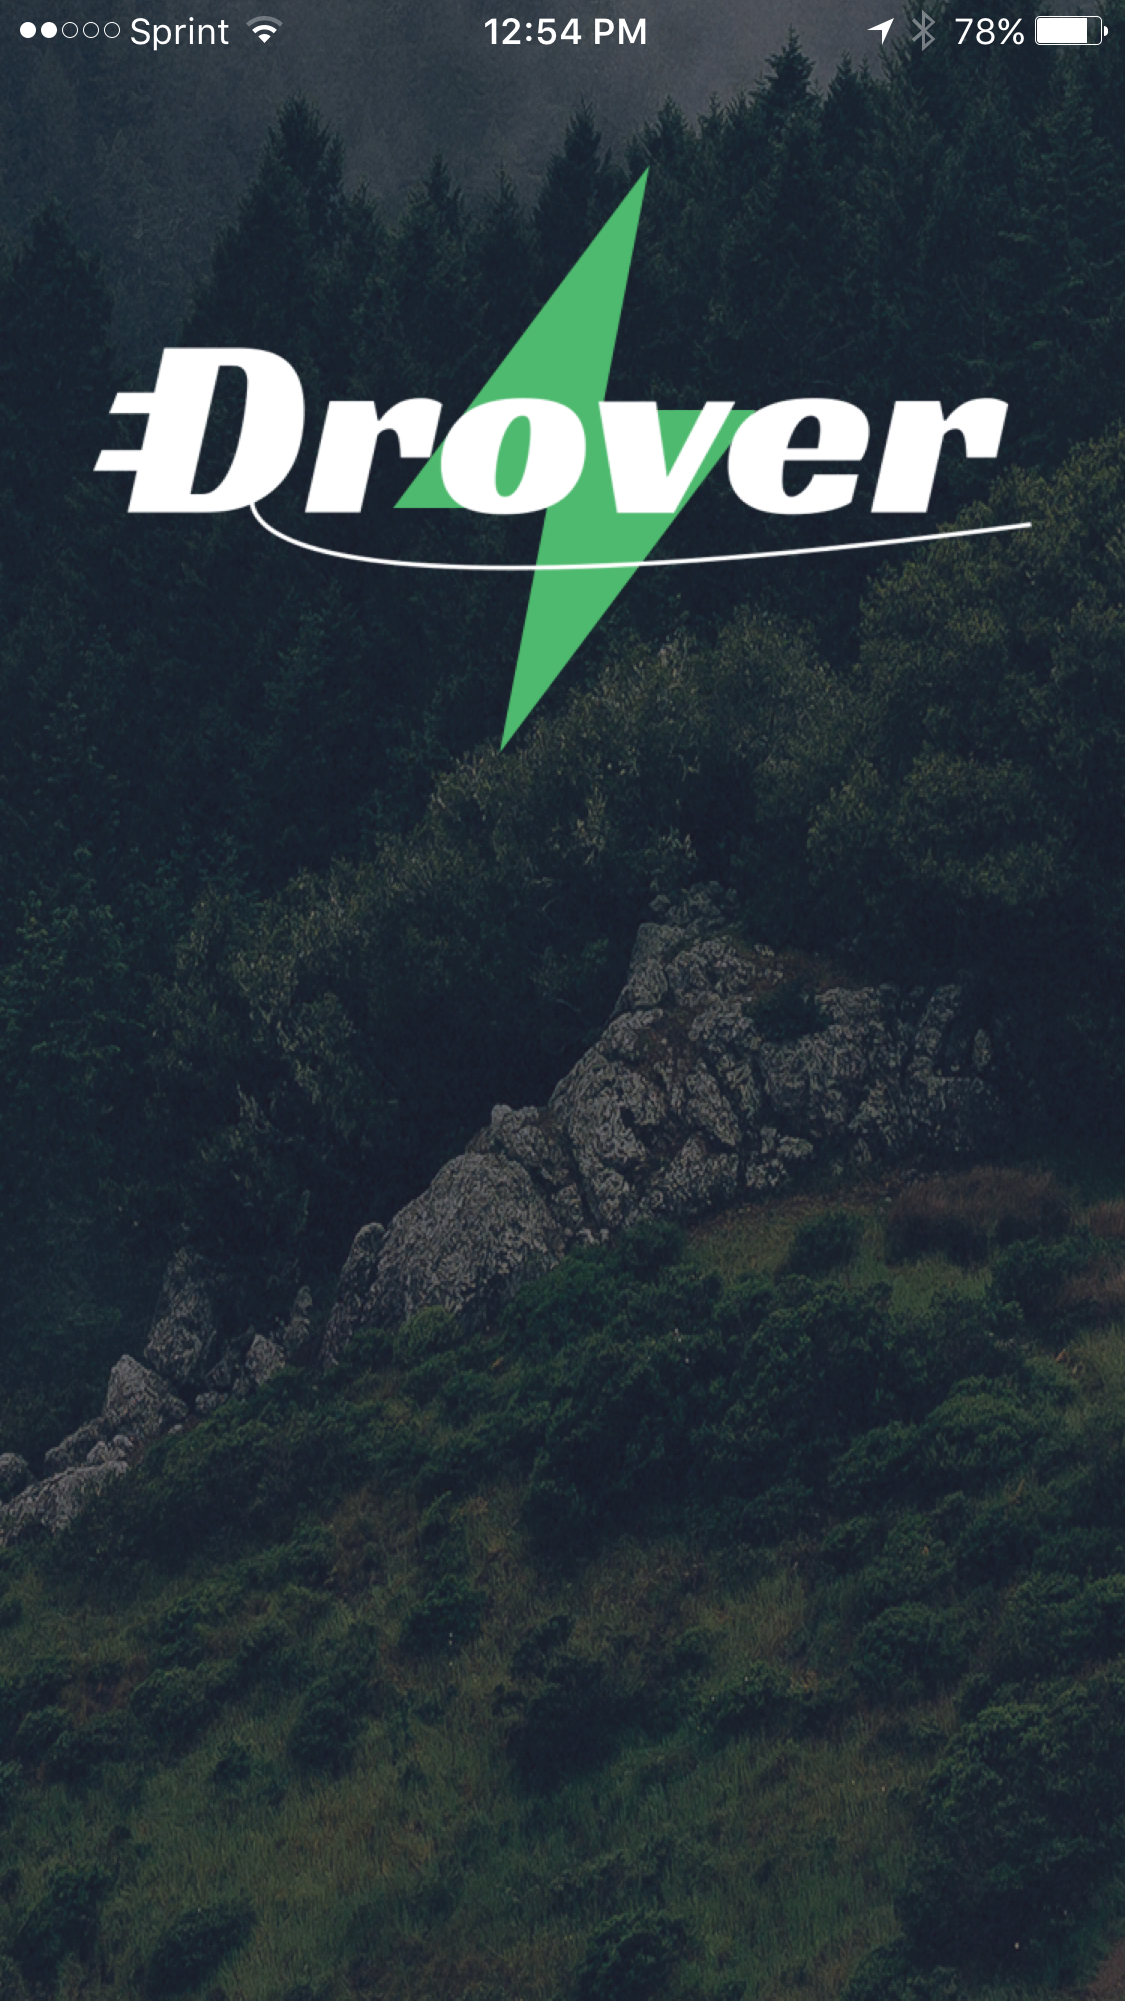 Drover App Launch Screen